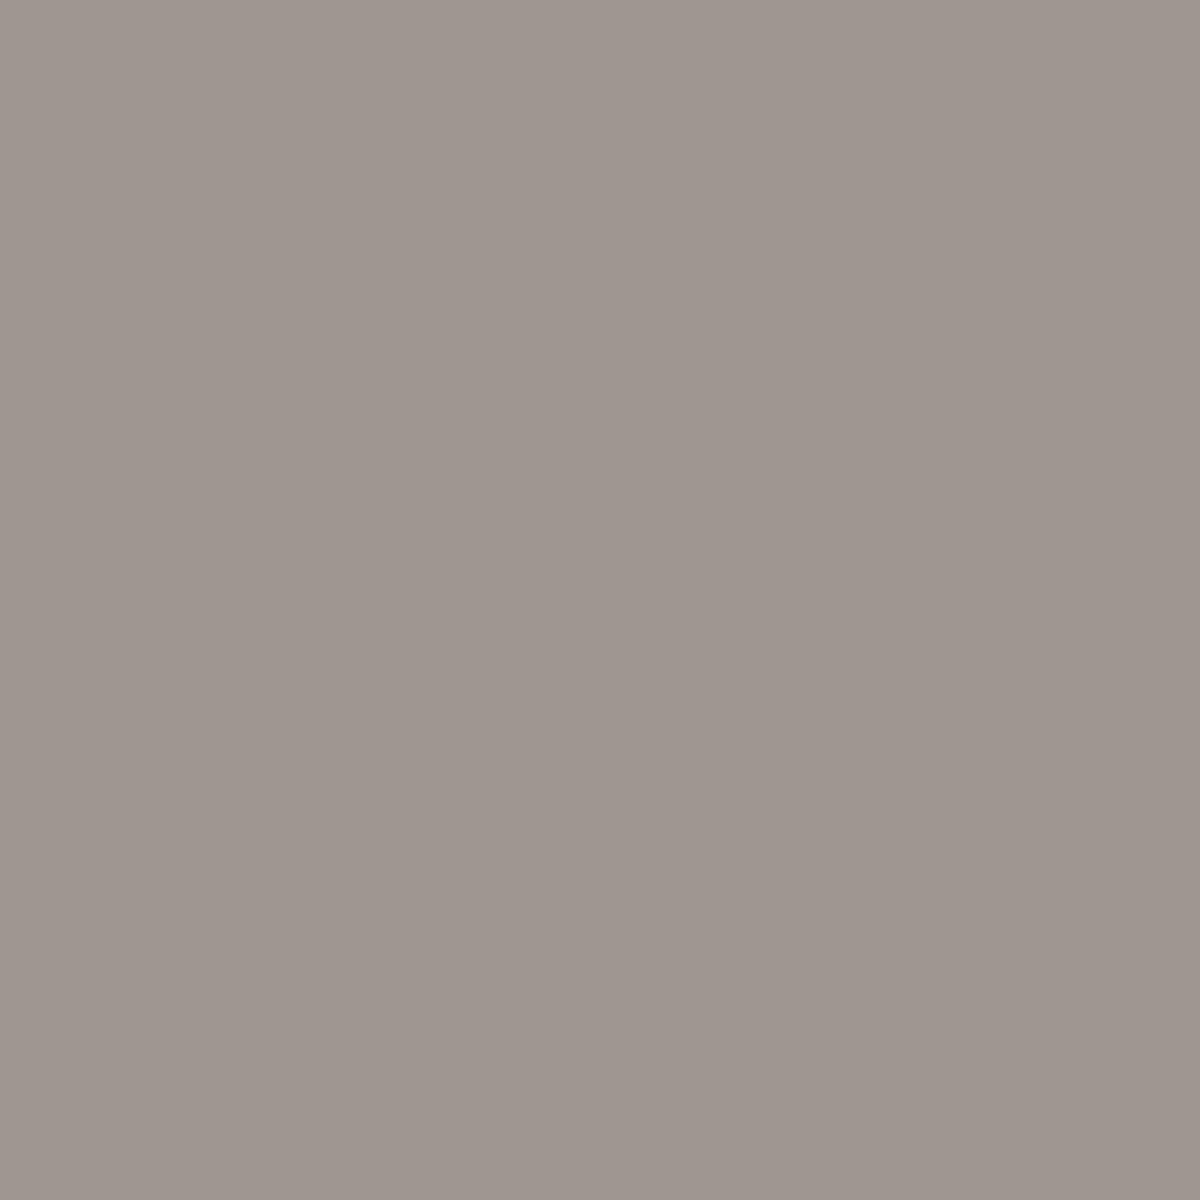 2770 Sarum Grey - Formica